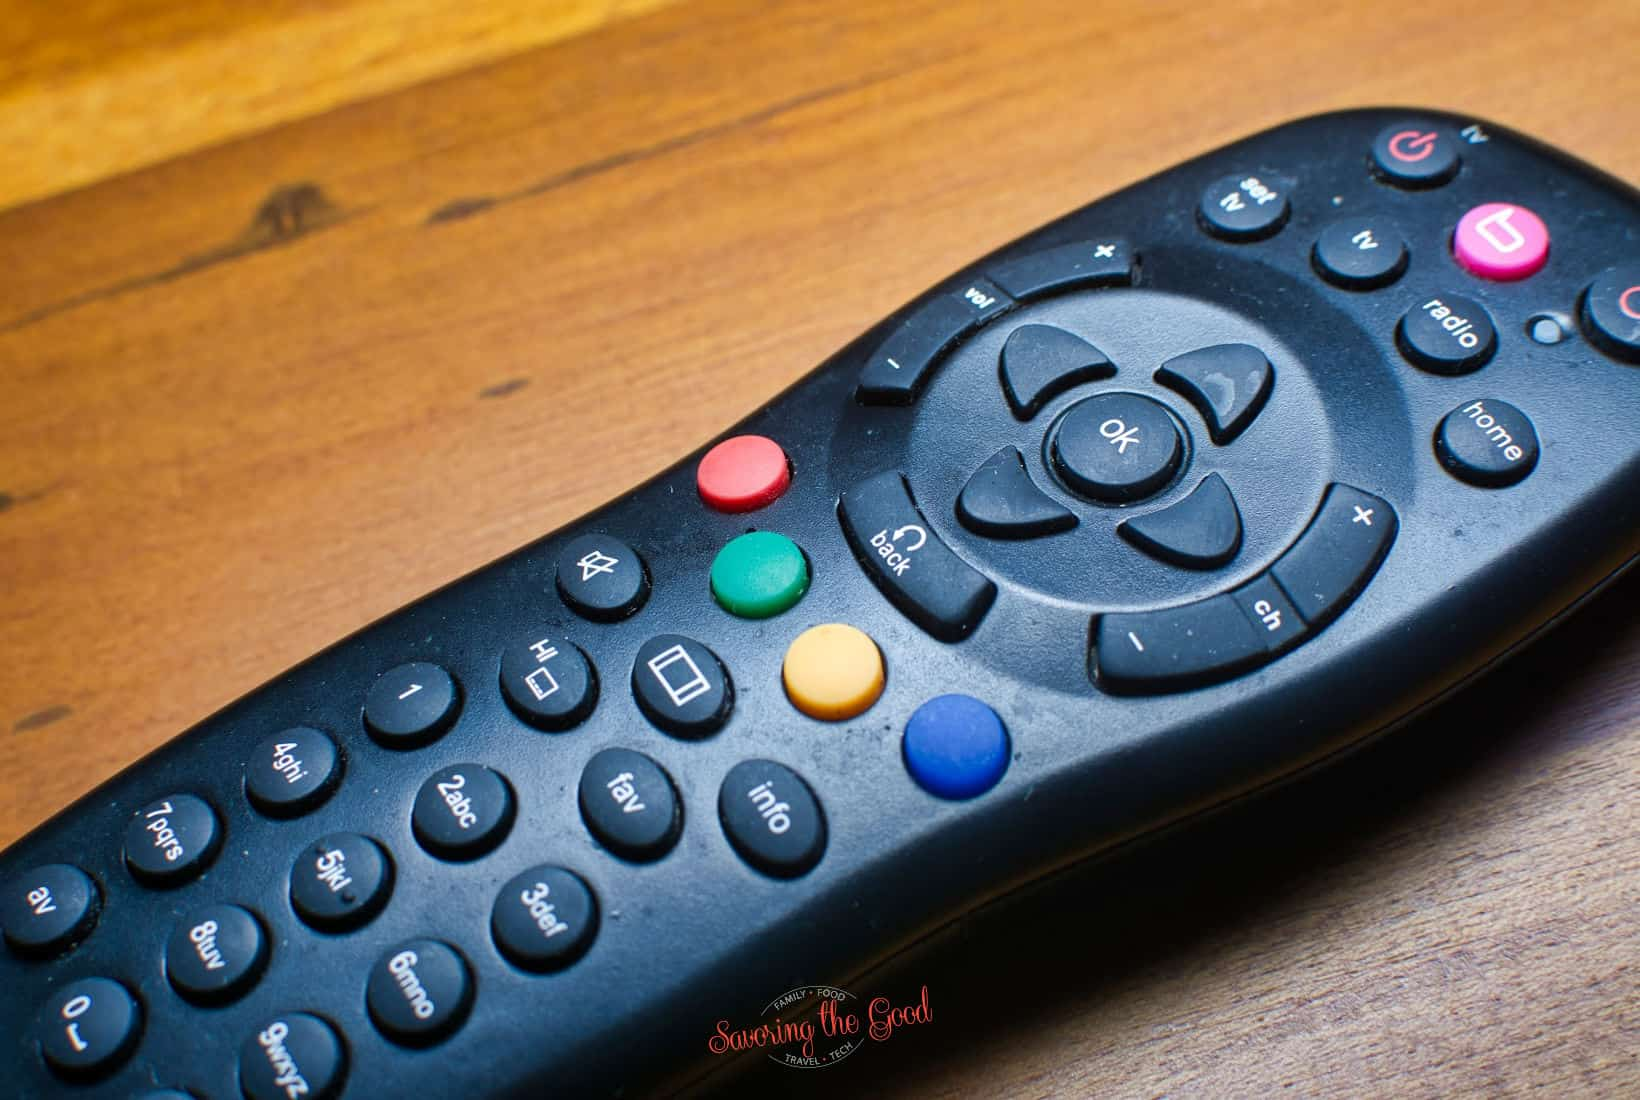 black universal remote